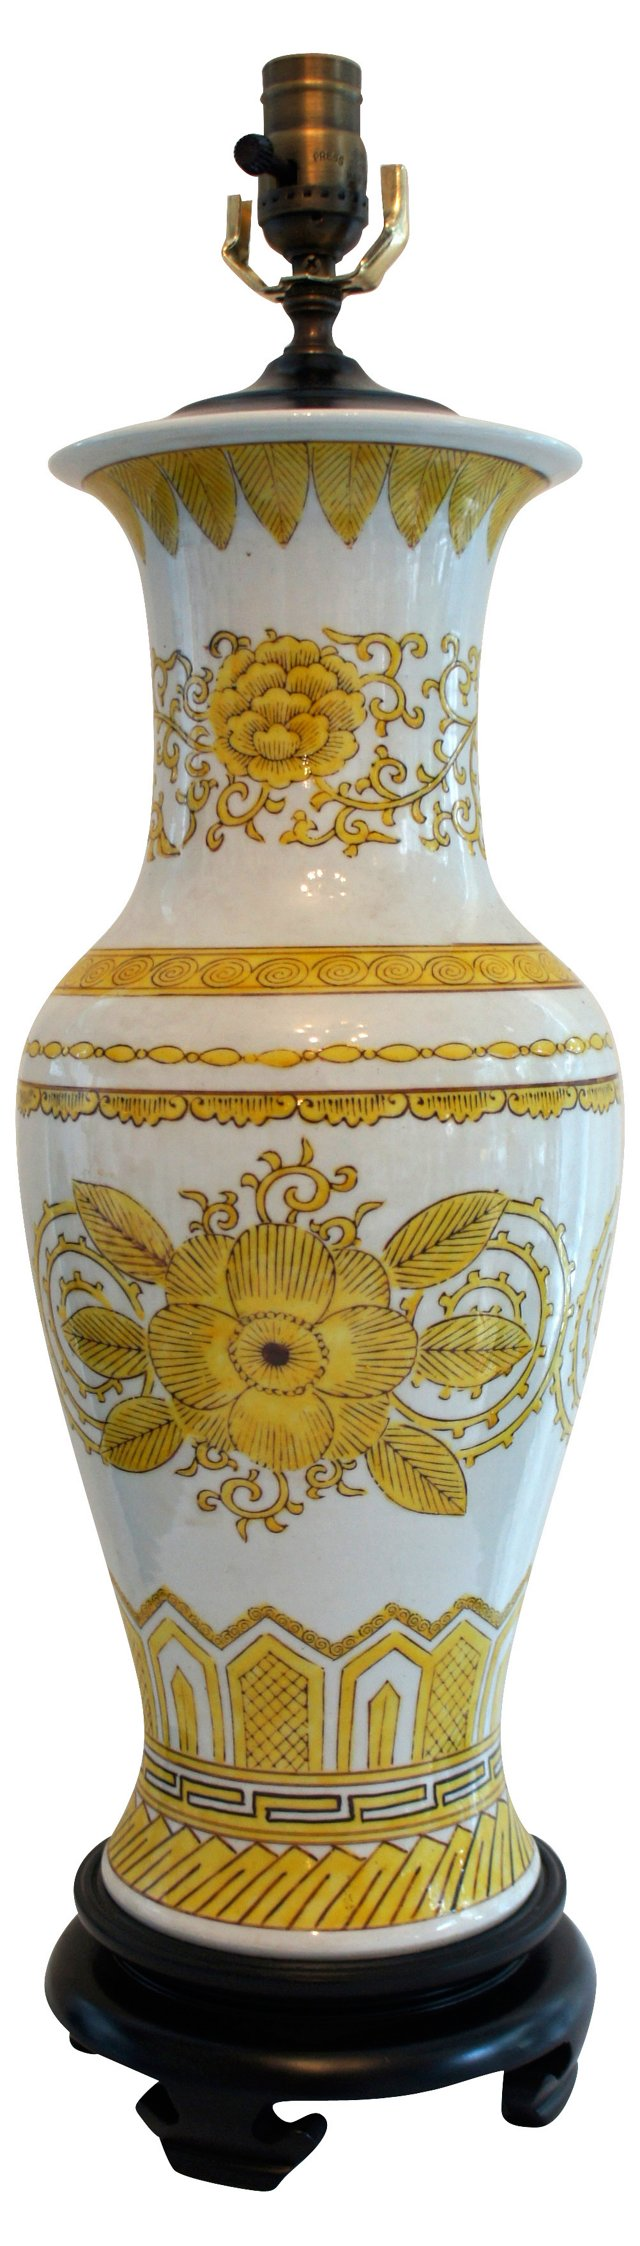 Asian Yellow Flower Lamp